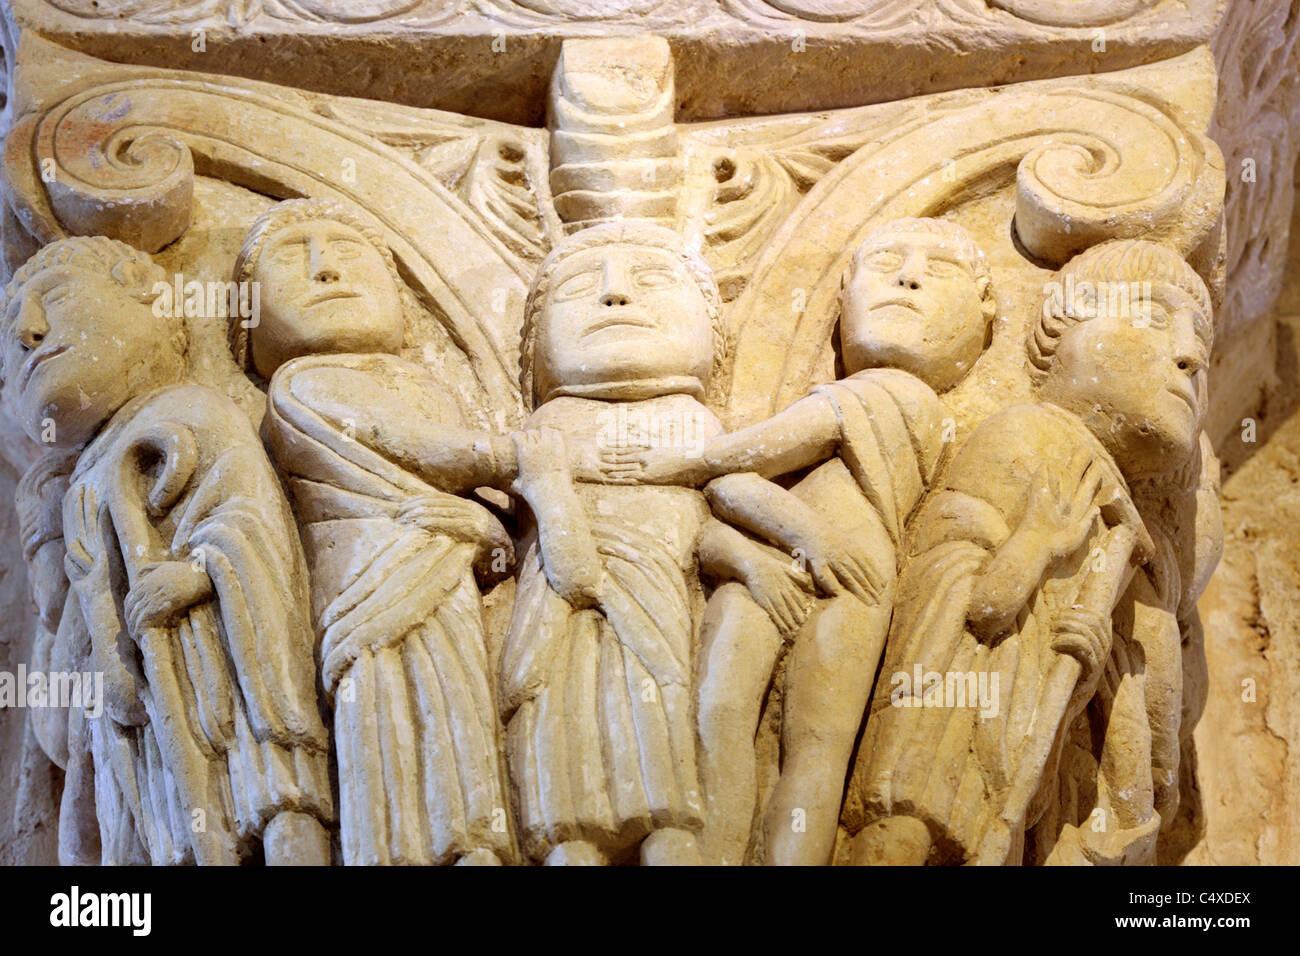 Romanesque church of San Martin de Tours, Fromista, Valladolid, Castile and Leon, Spain - Stock Image